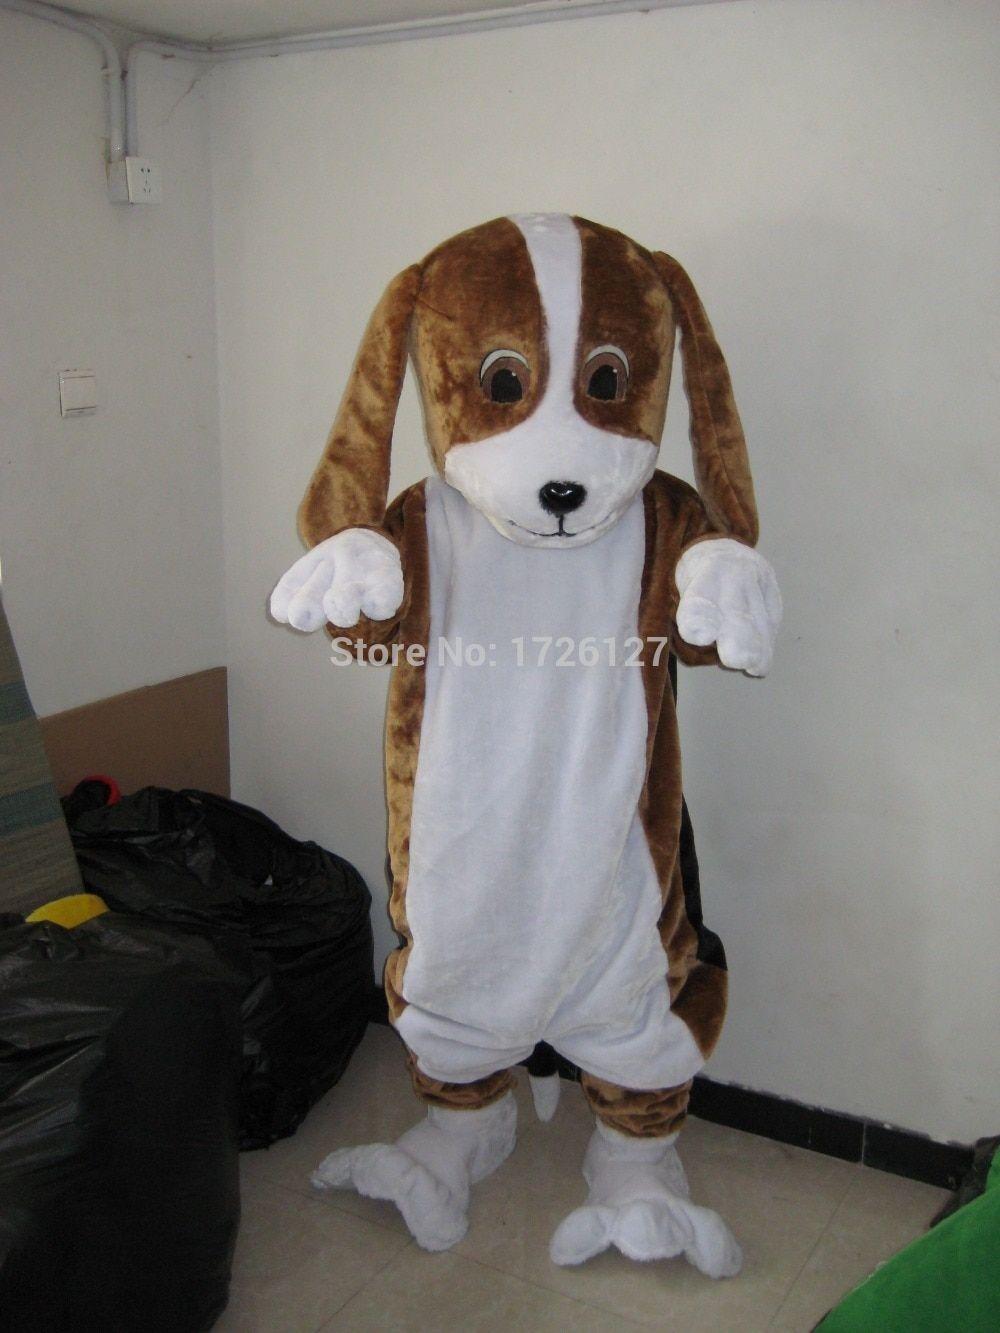 mascot Hound dog mascot Beagle dog costume custom fancy